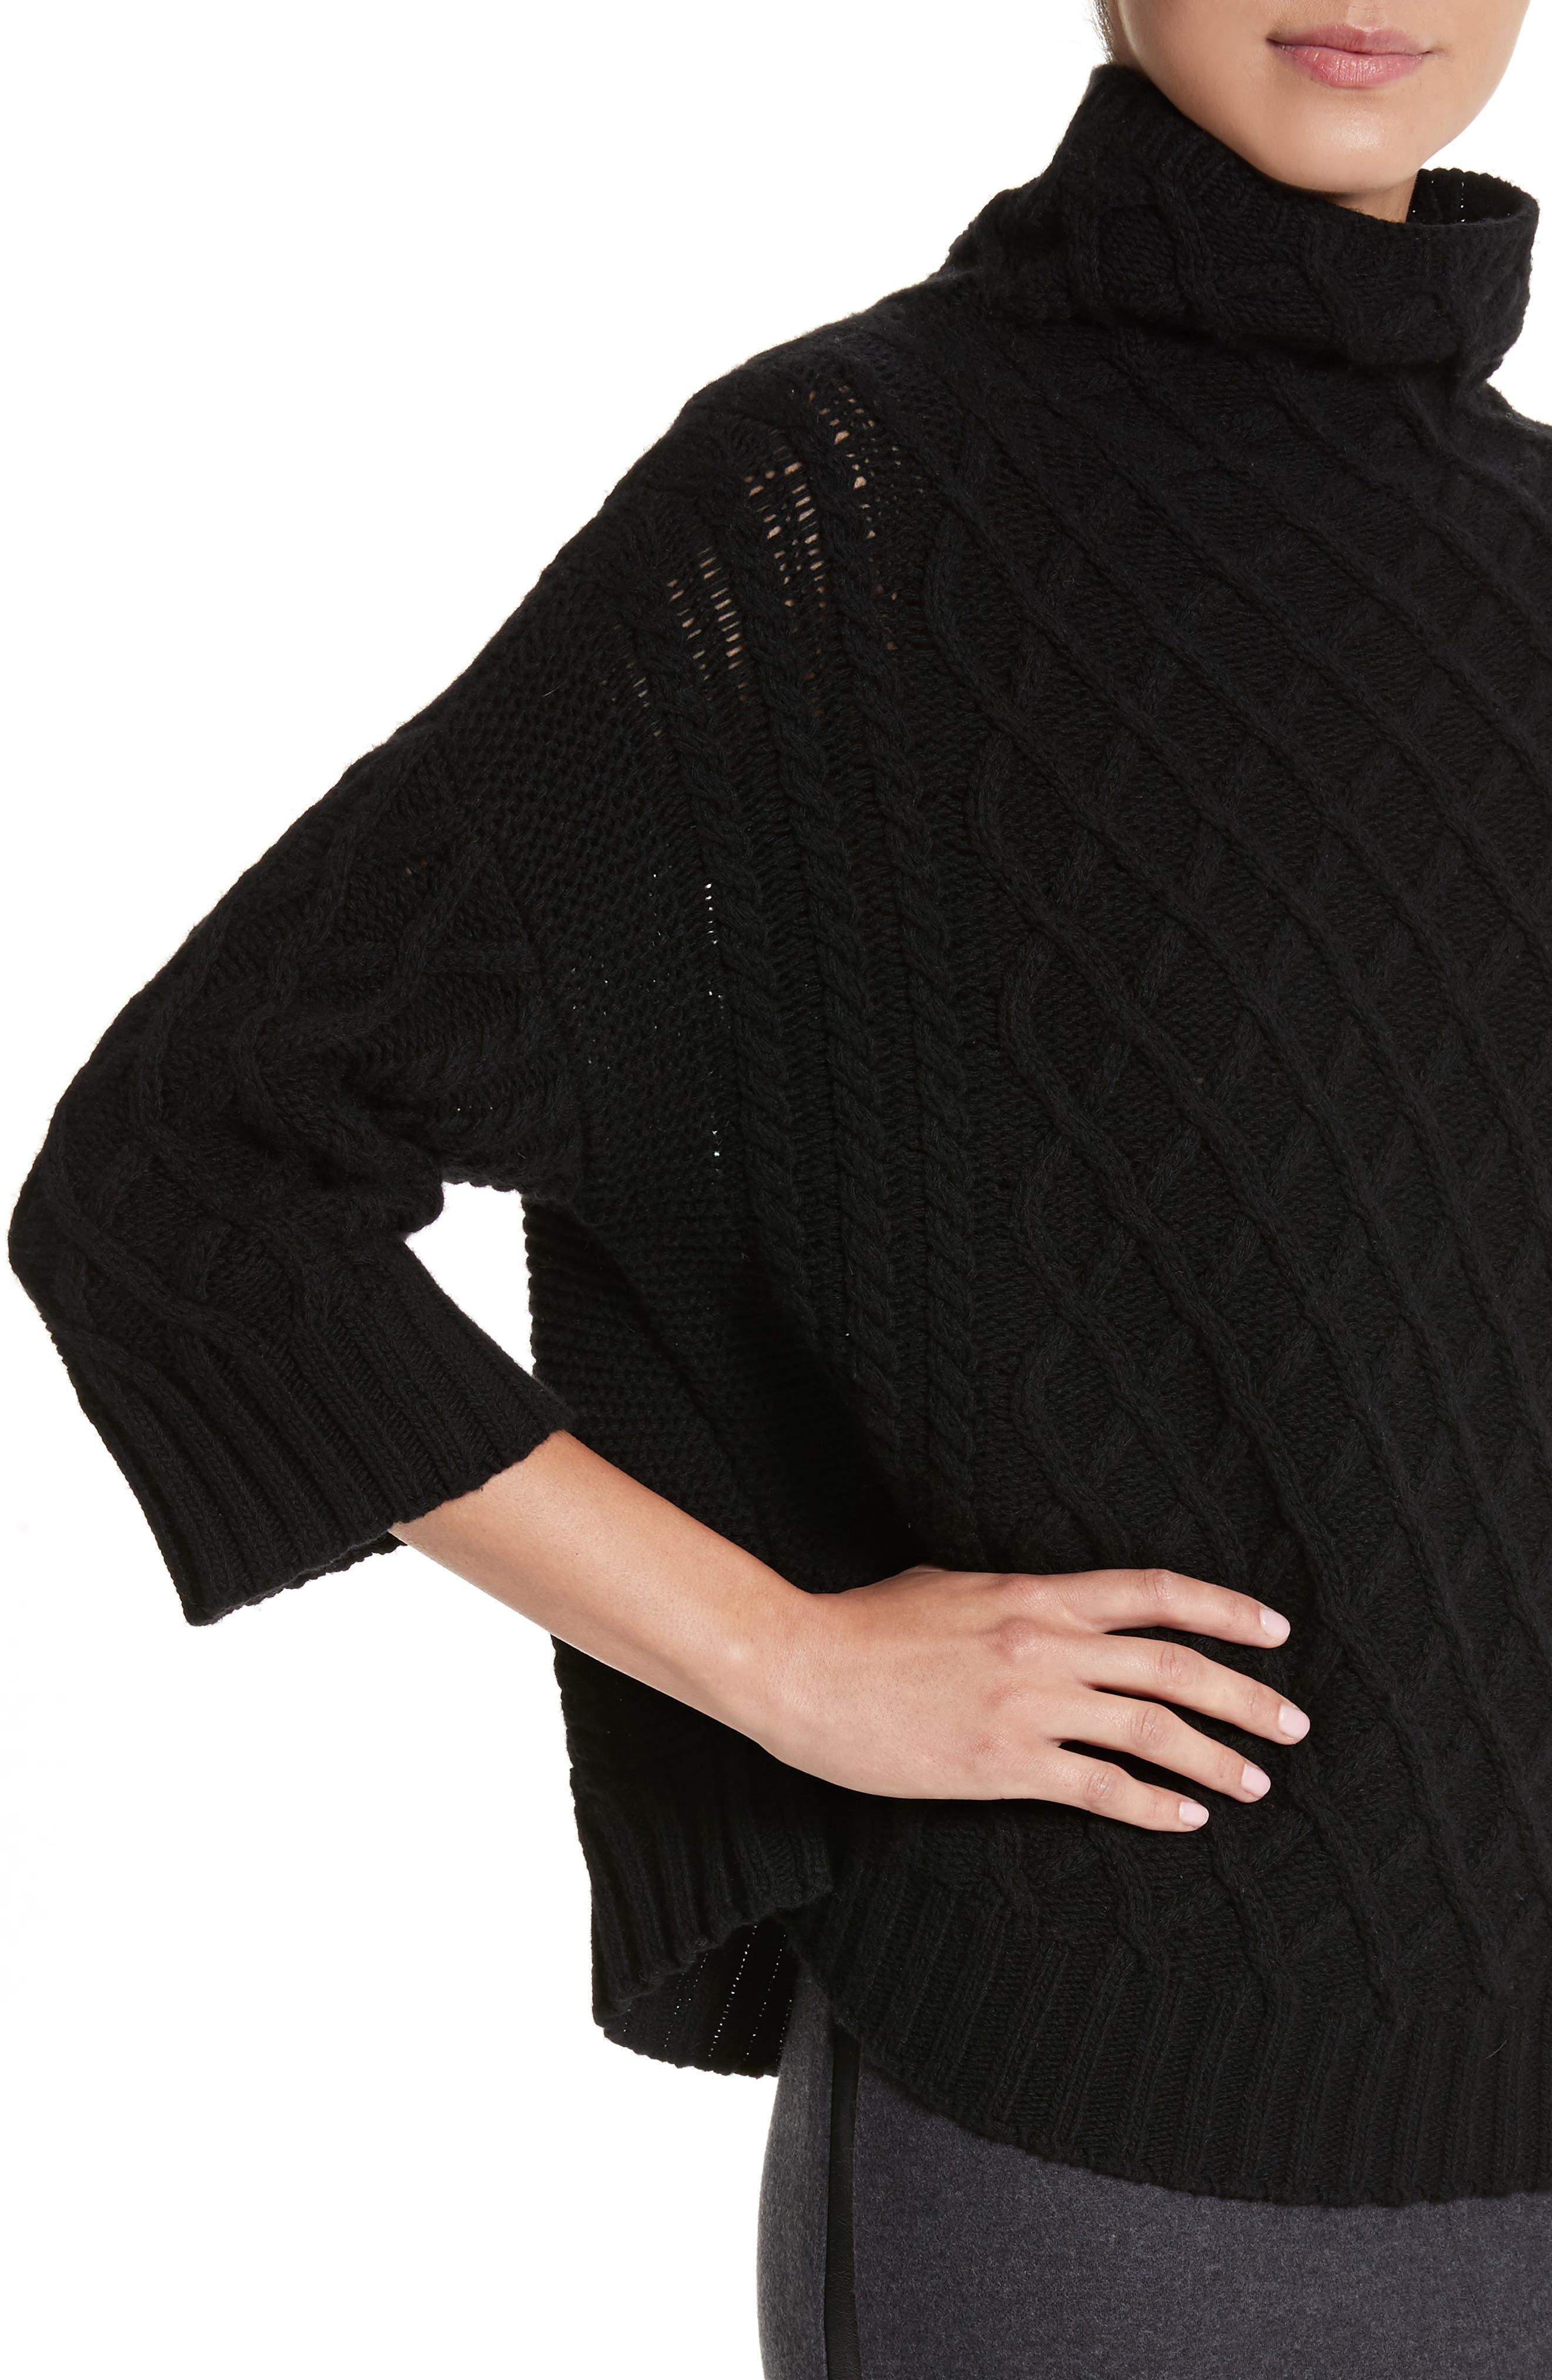 Alternate Image 4  - Max Mara Cantone Wool & Cashmere Funnel Neck Sweater